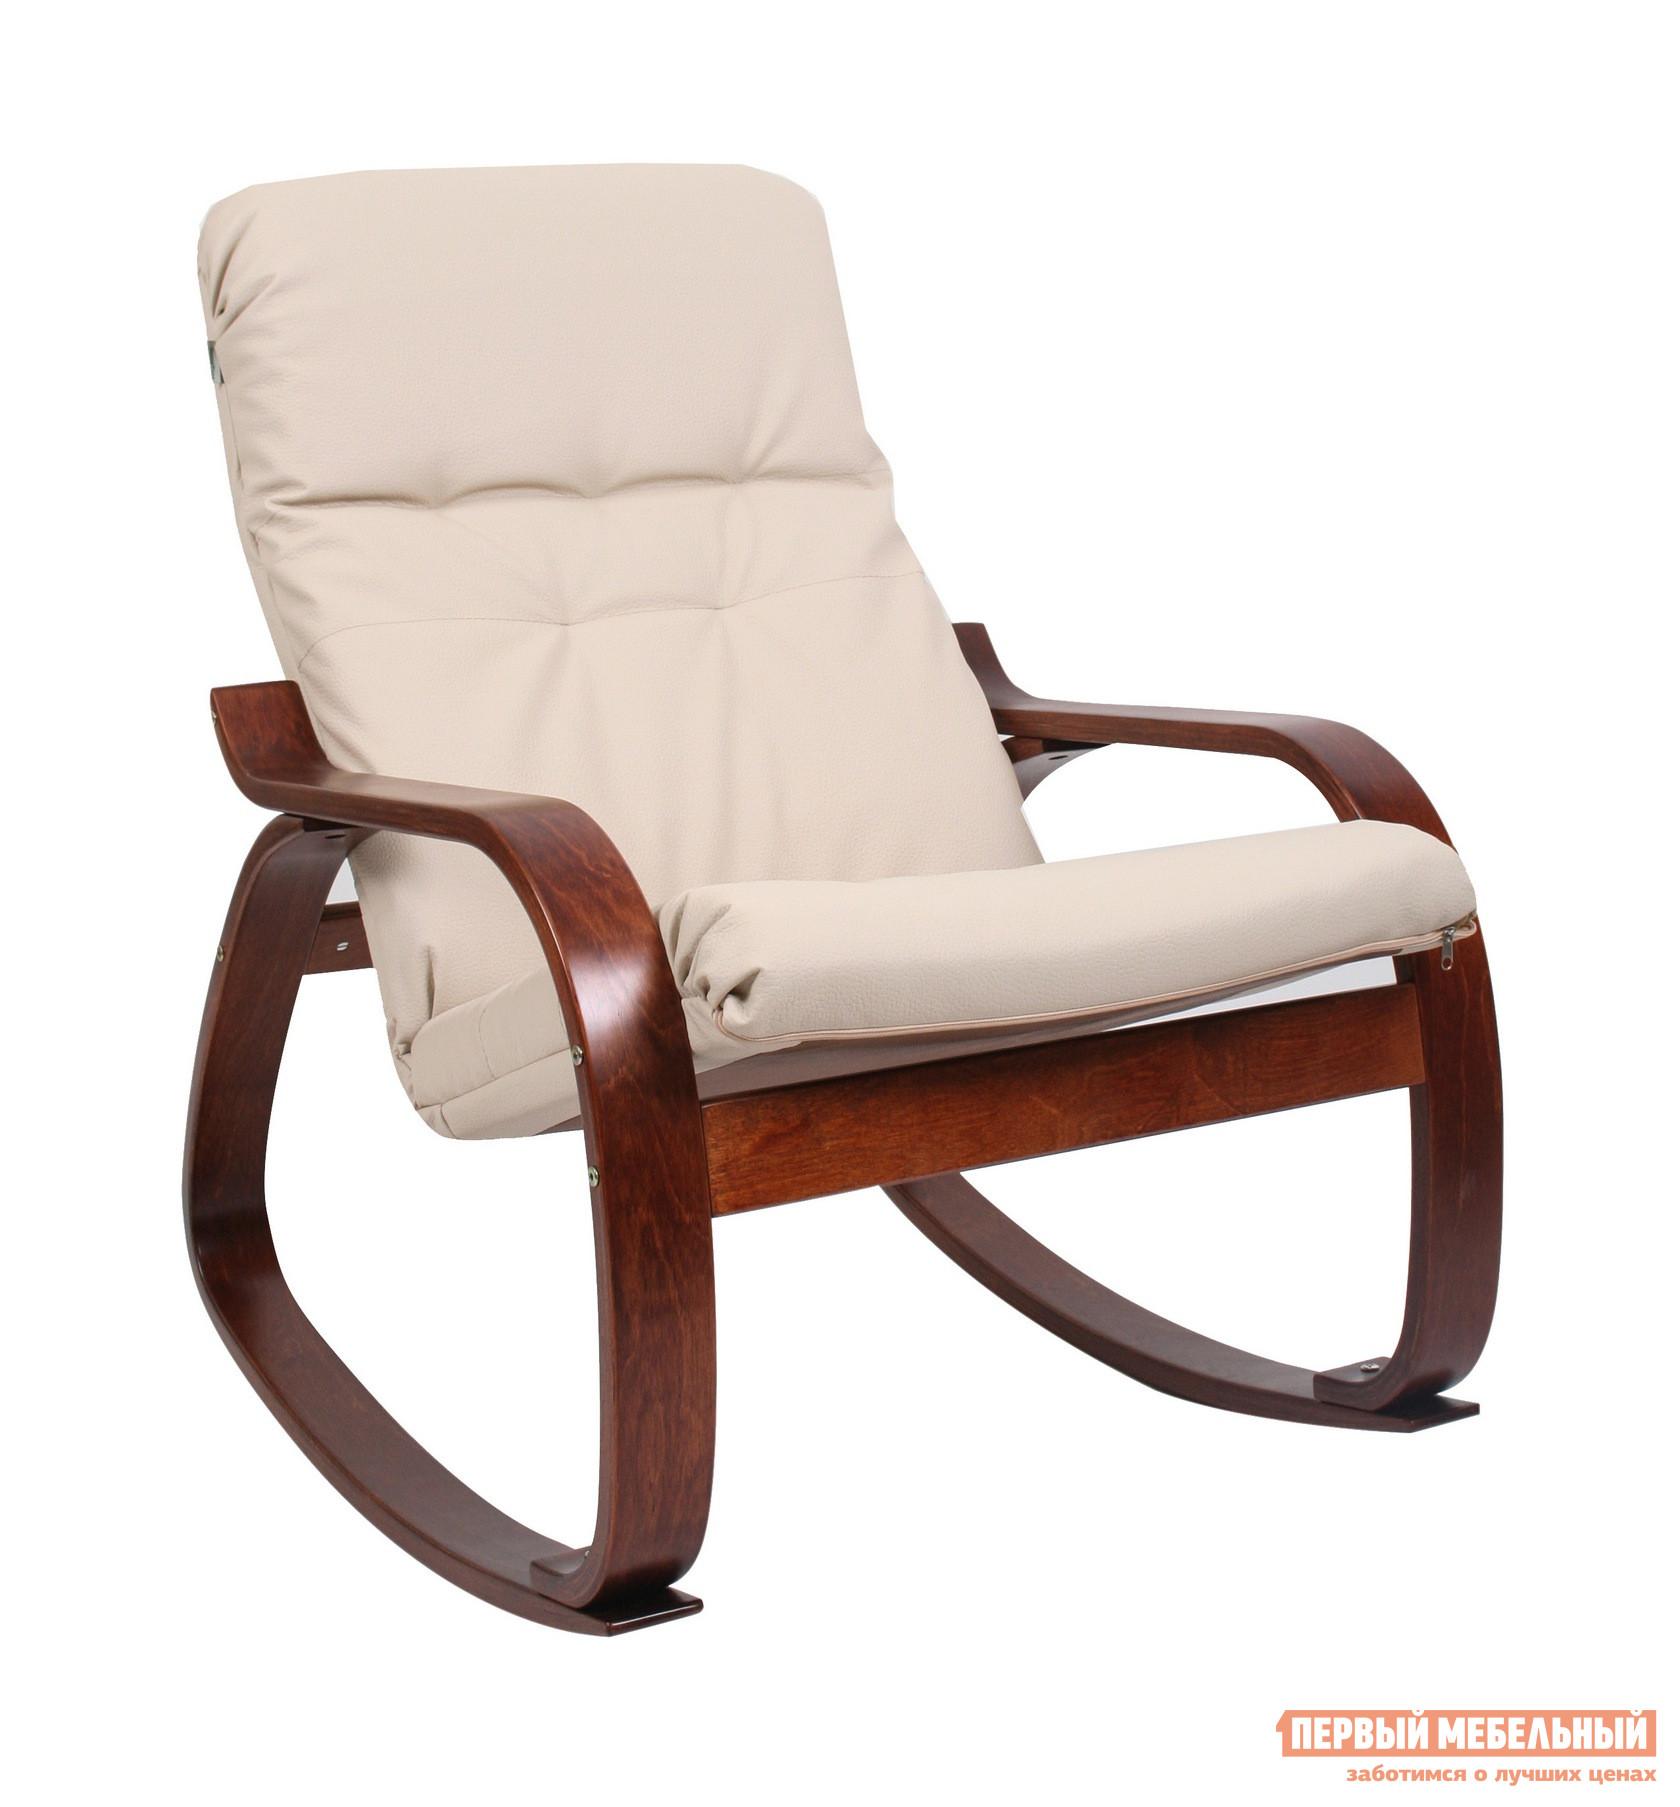 Кресло-качалка Мебель Импэкс Кресло-качалка Сайма экокожа кресло качалка дизайнерское jimi